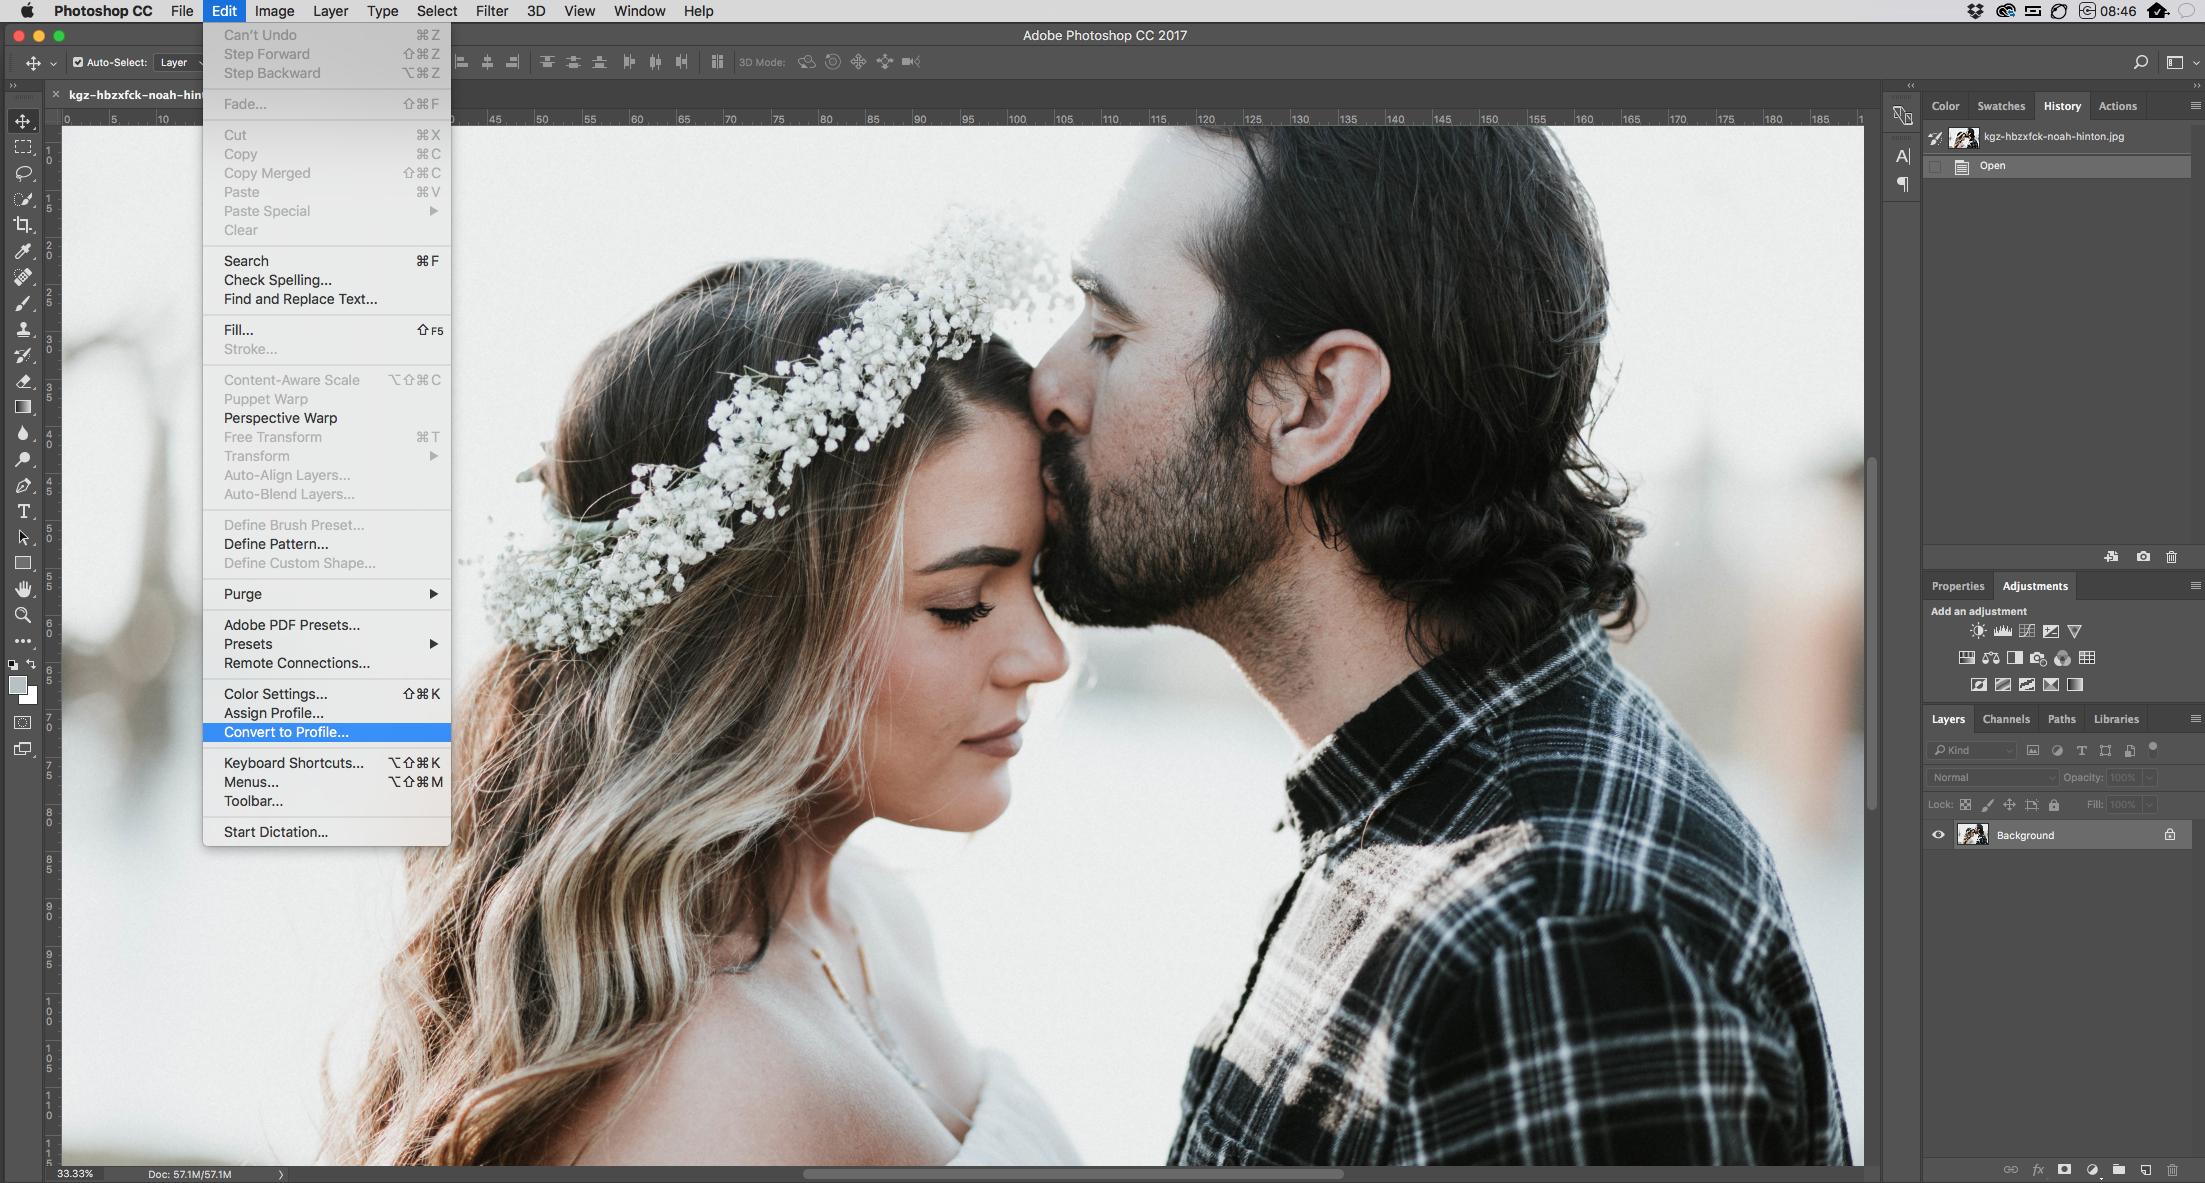 sRGB vs AdobeRGB option in Photoshop